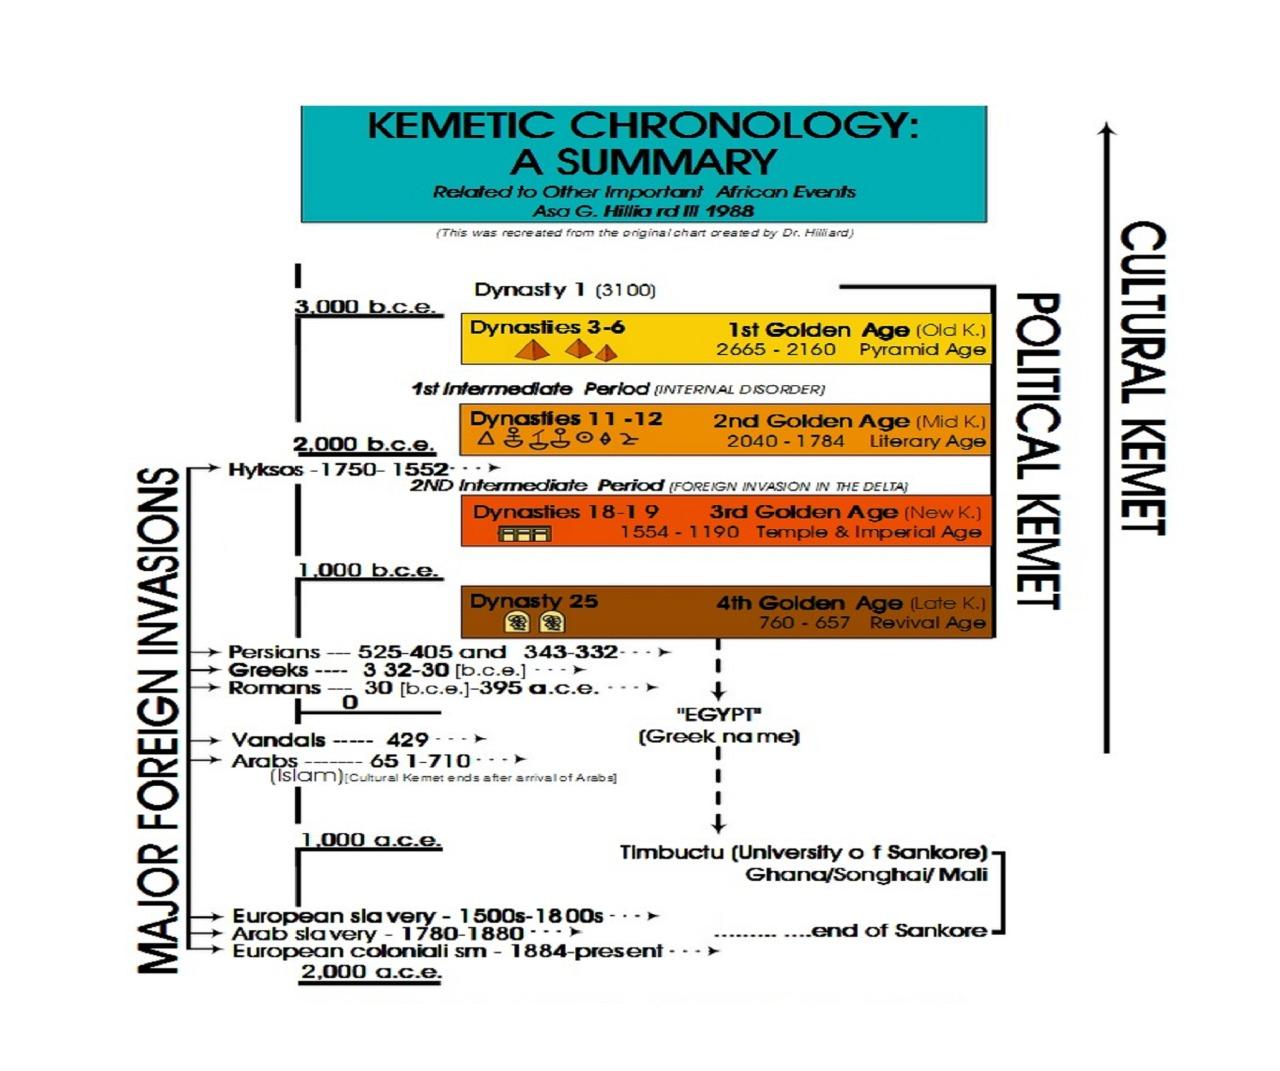 Distant Relatives Ancient Egypt Kemet Chronology Timeline